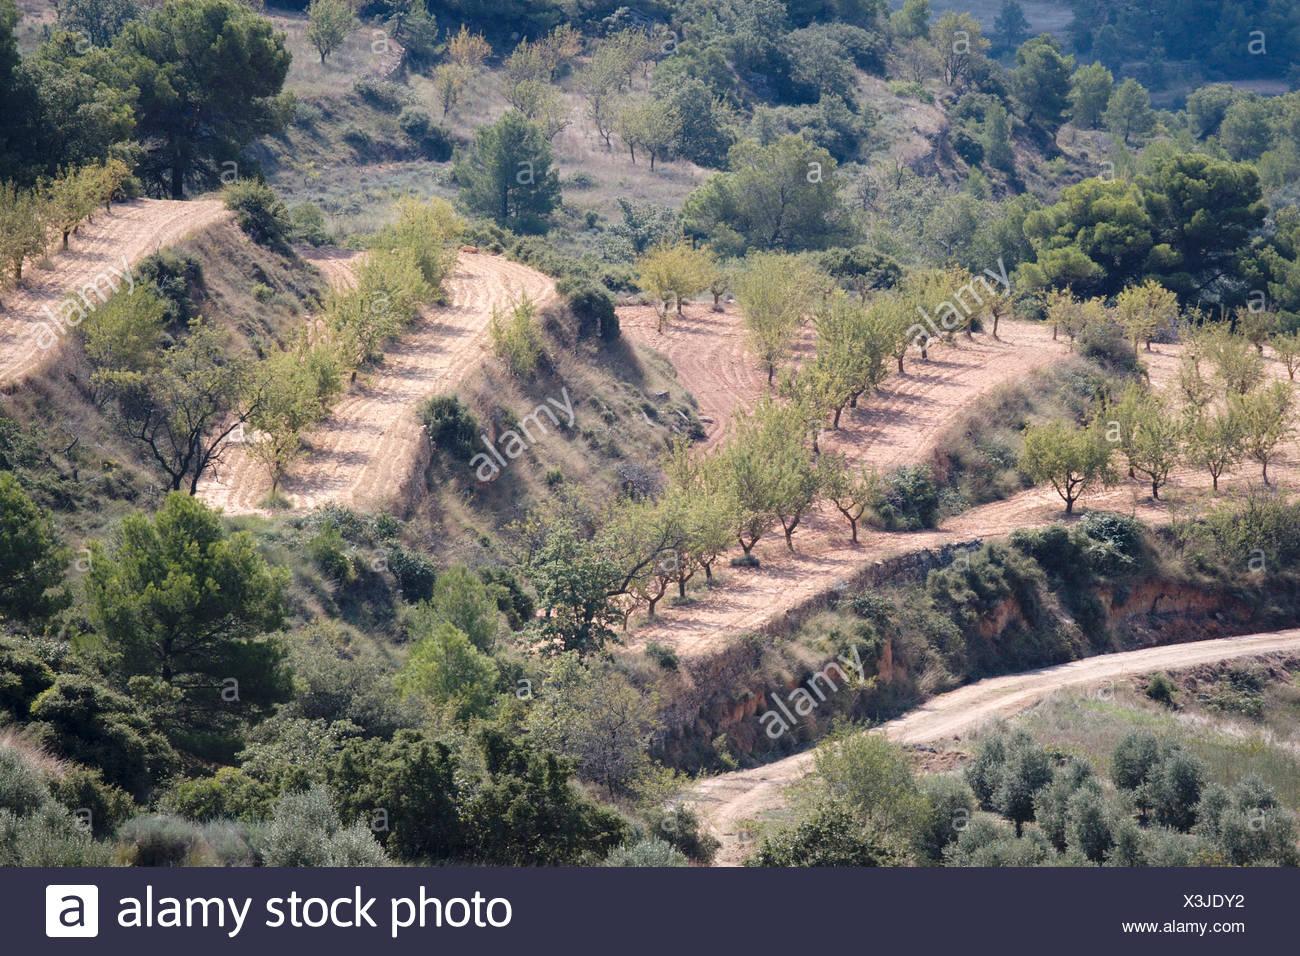 Spain, Catalunya, Terraced olive grove - Stock Image